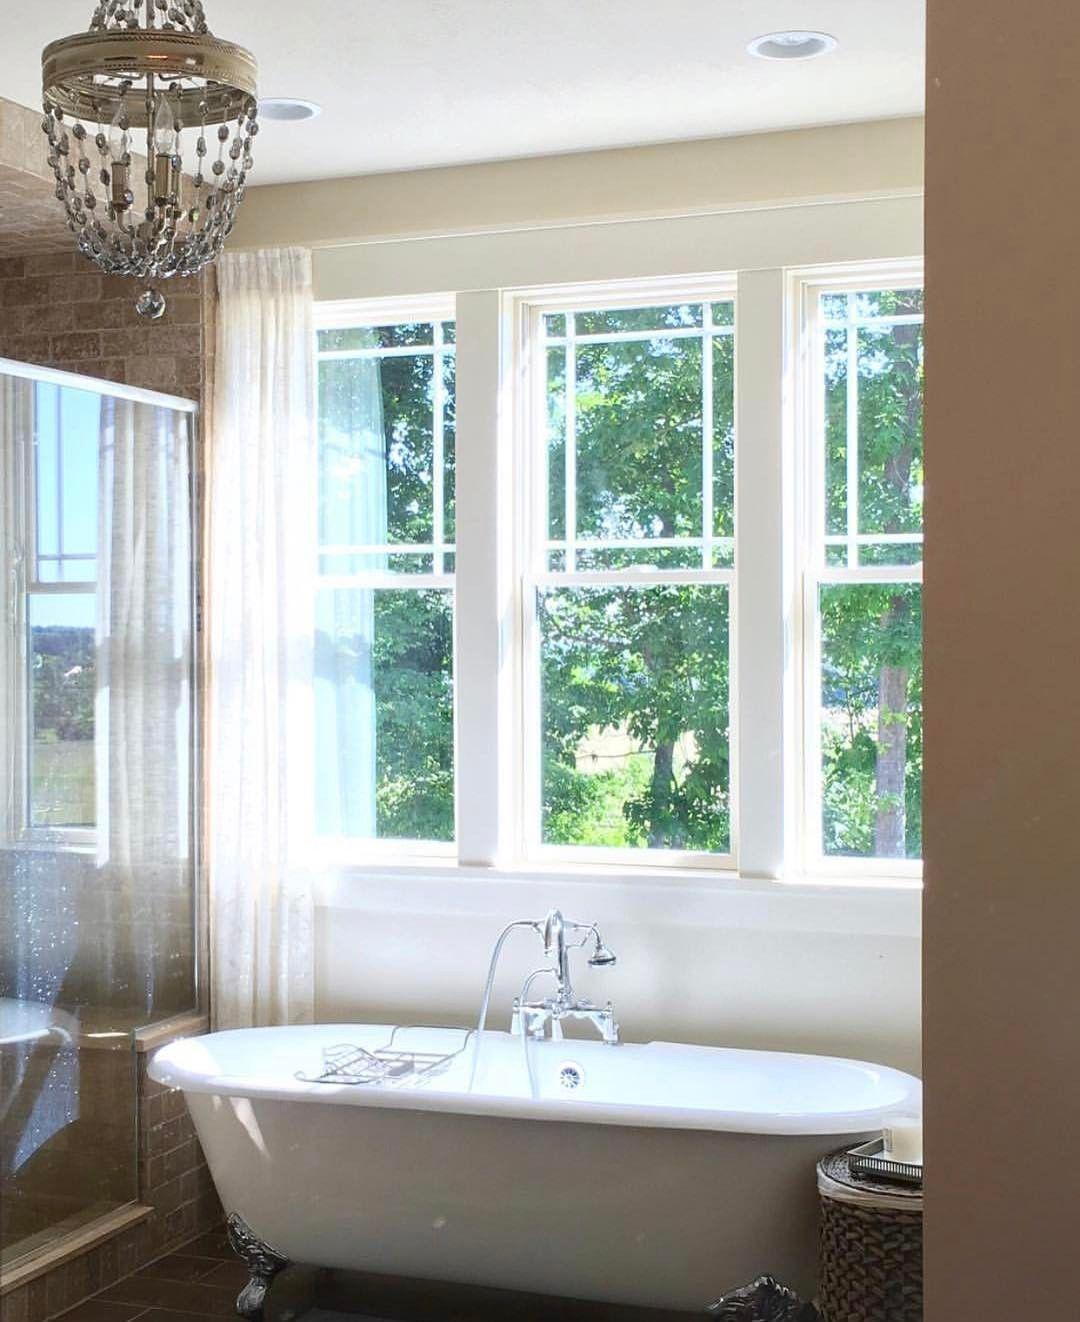 Love the tub and windows!   Bathrooms   Pinterest   Bath, House and Tubs